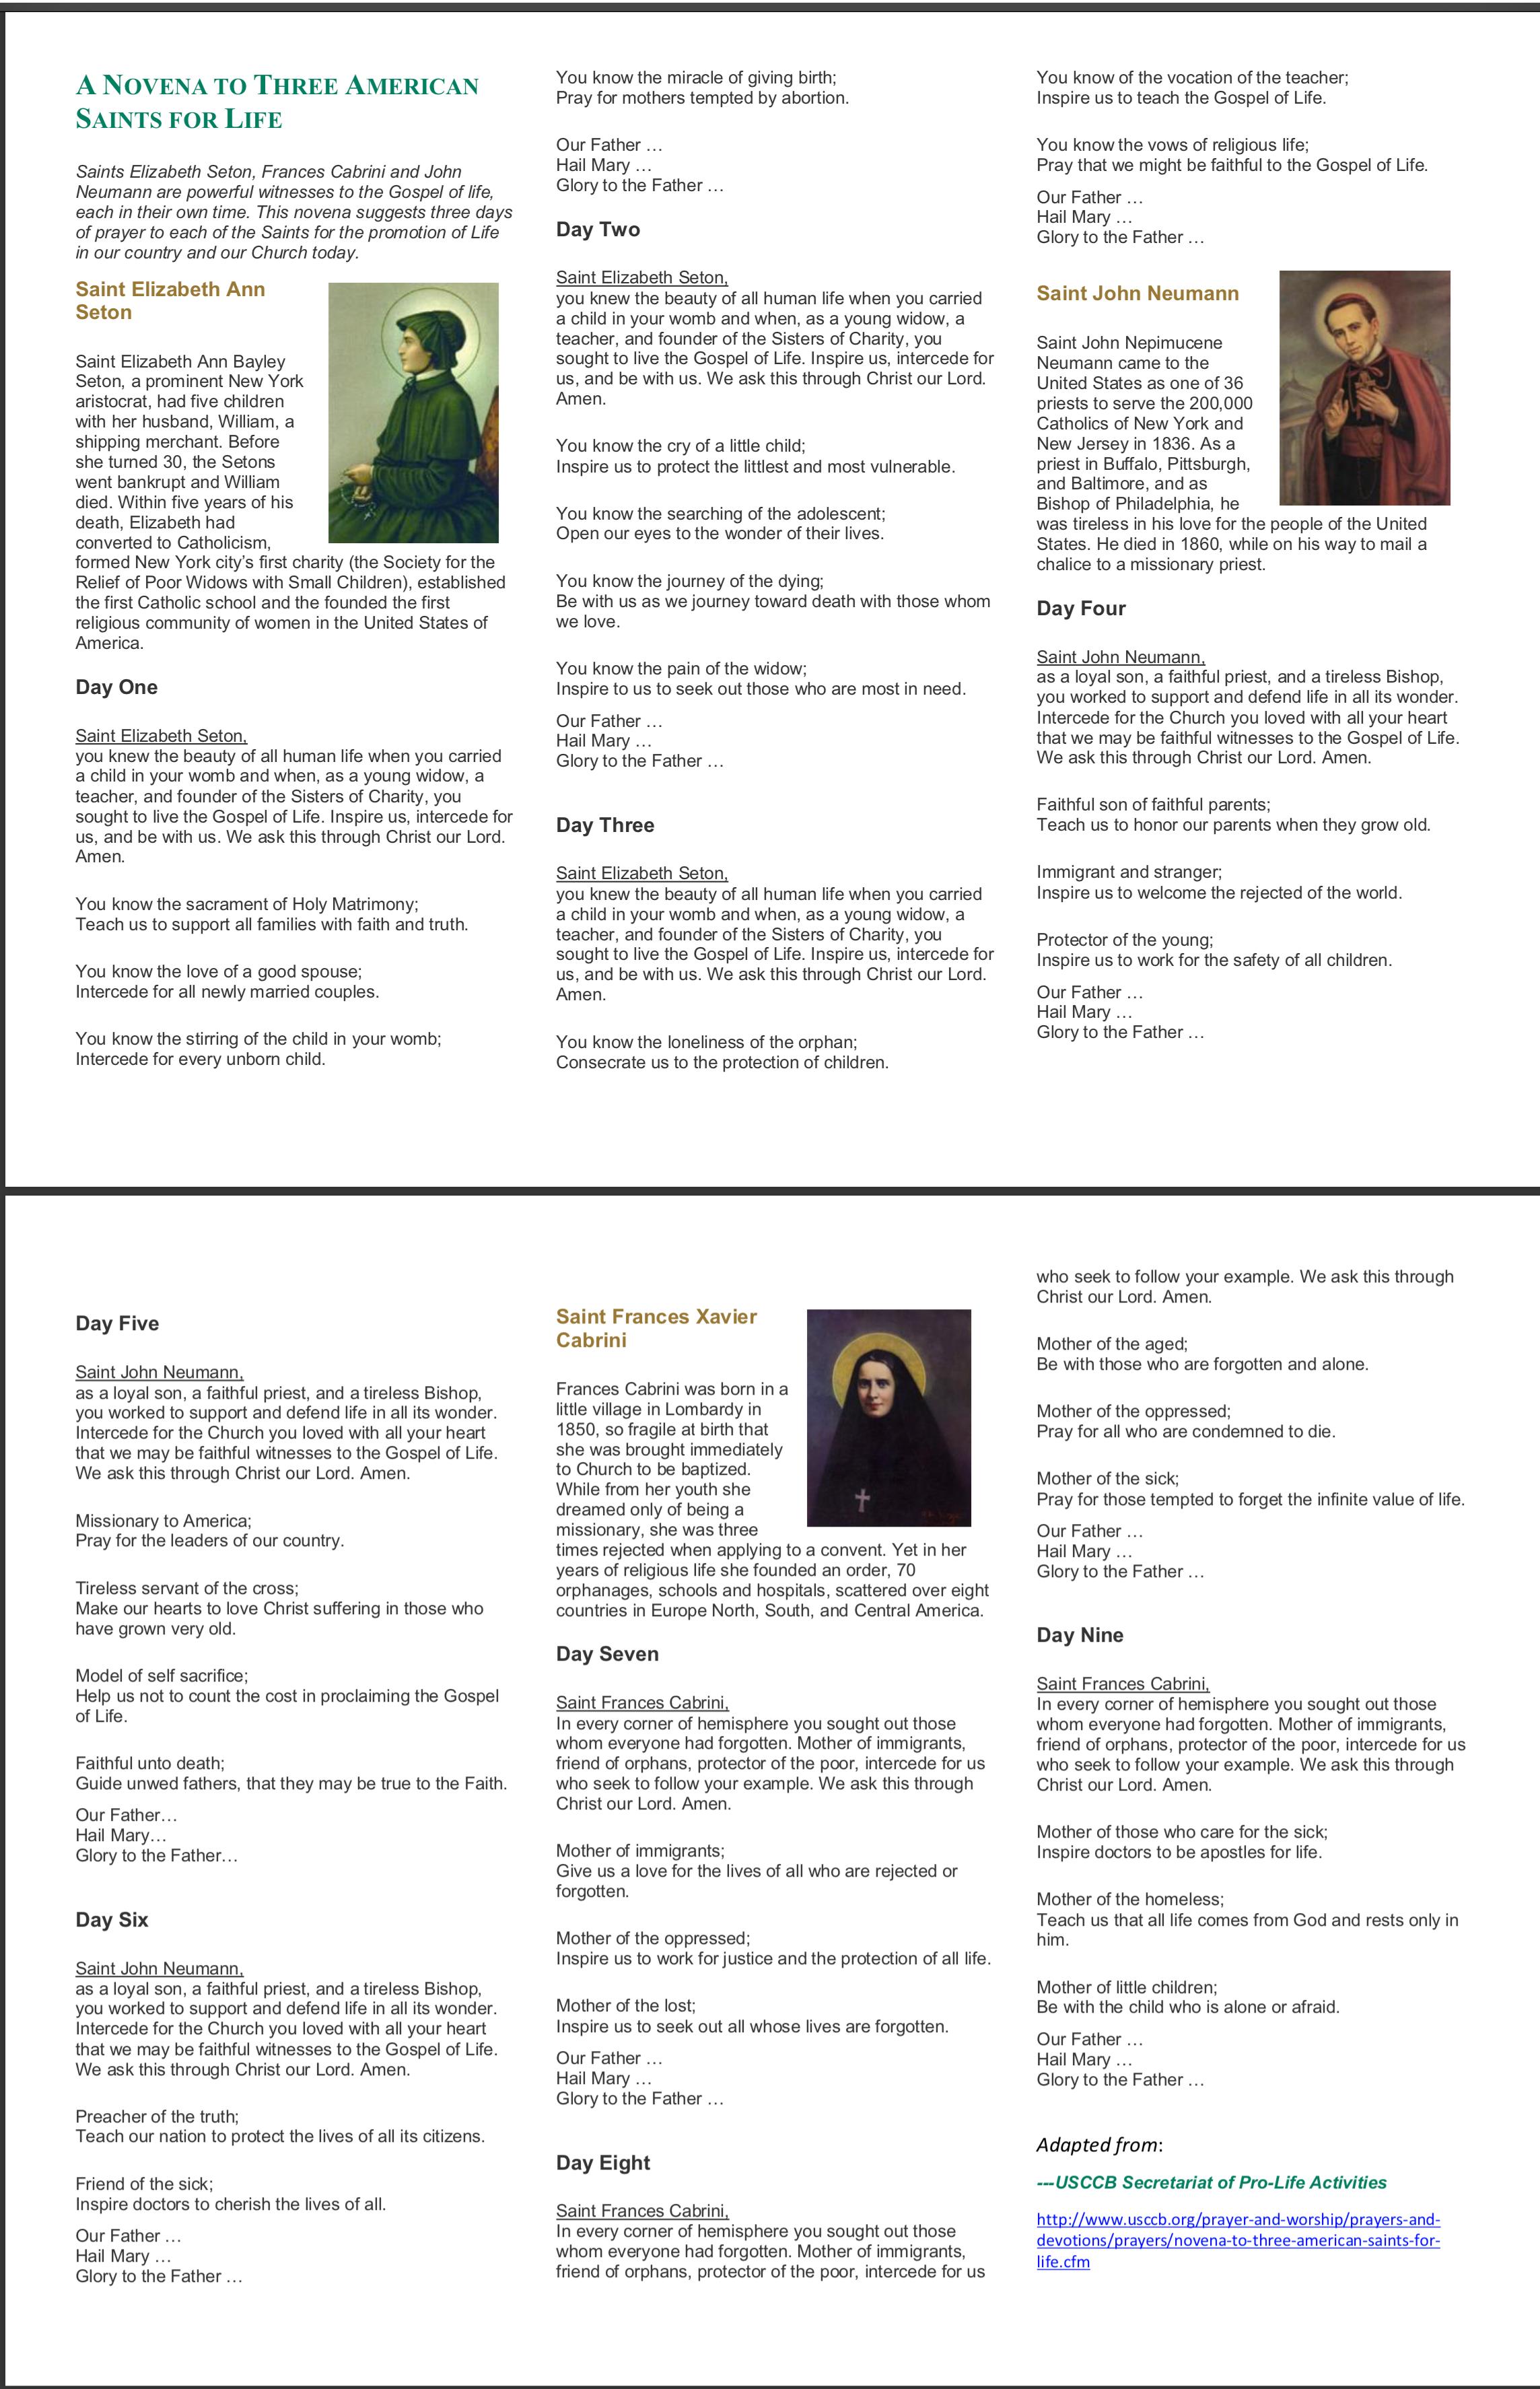 Download Novena flyer as a printable PDF